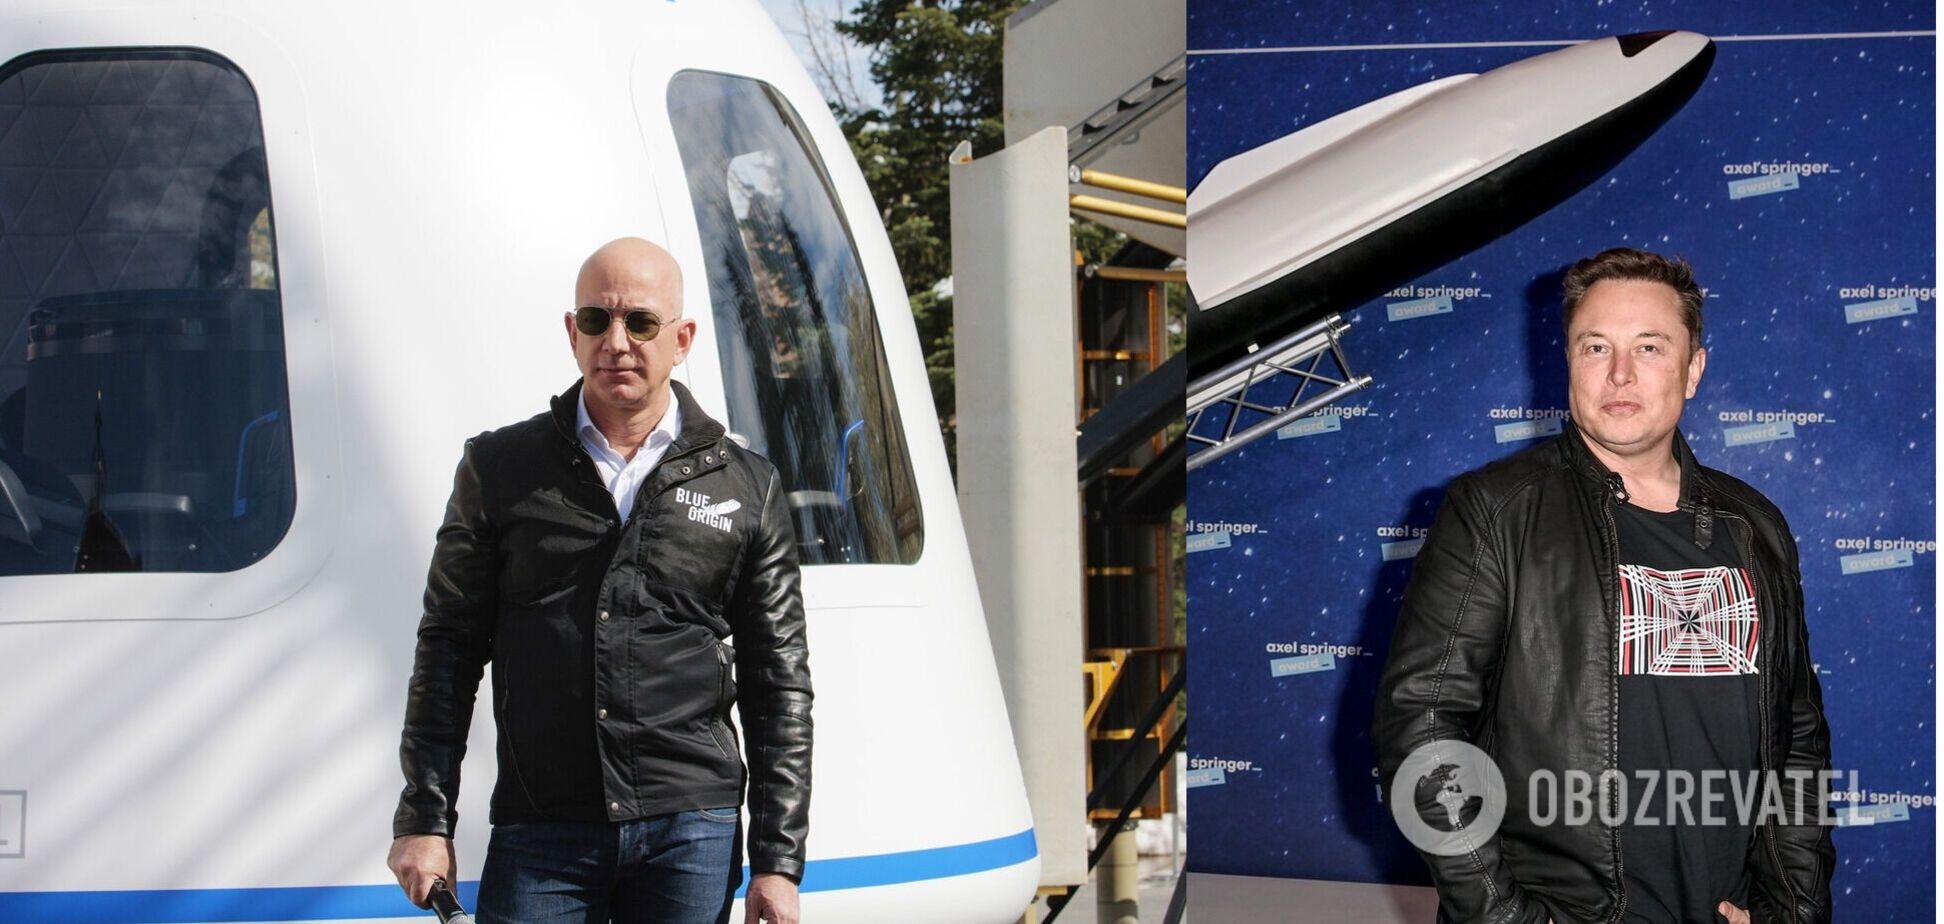 Blue Origin конкурувала з компанією SpaceX